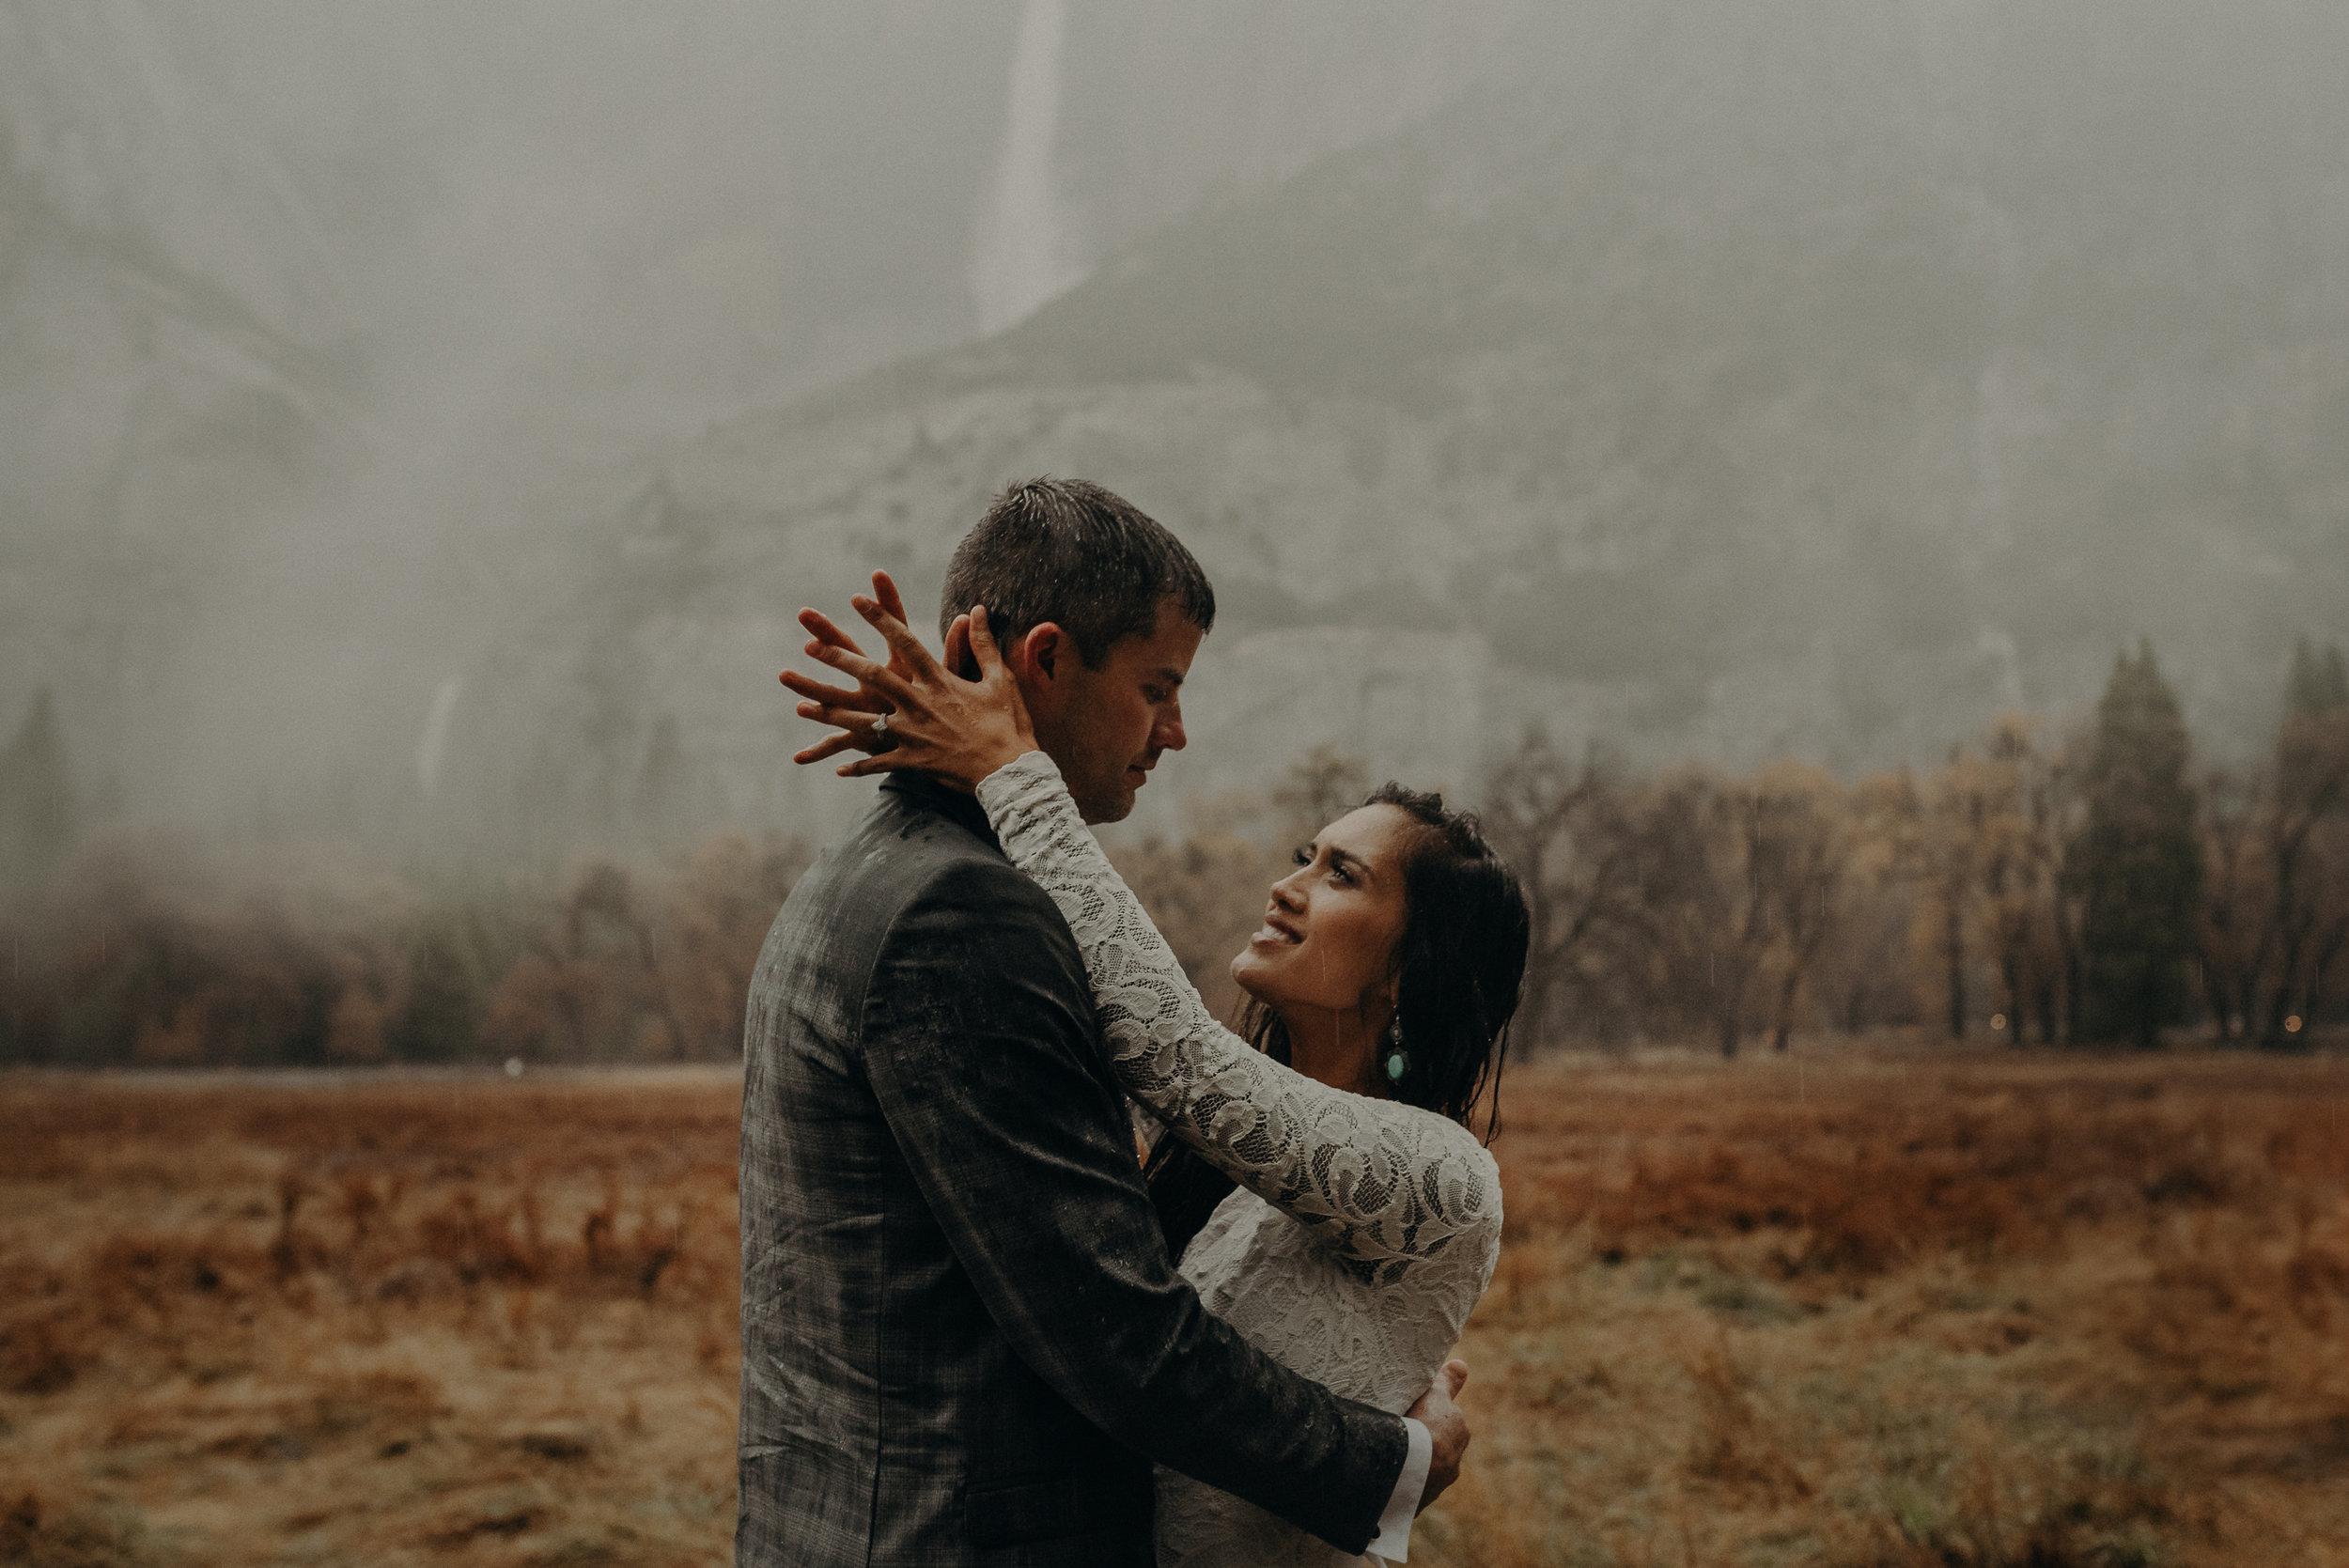 Isaiah + Taylor Photography - Yosemite Elopement - Los Angeles Wedding Photographer-63.jpg